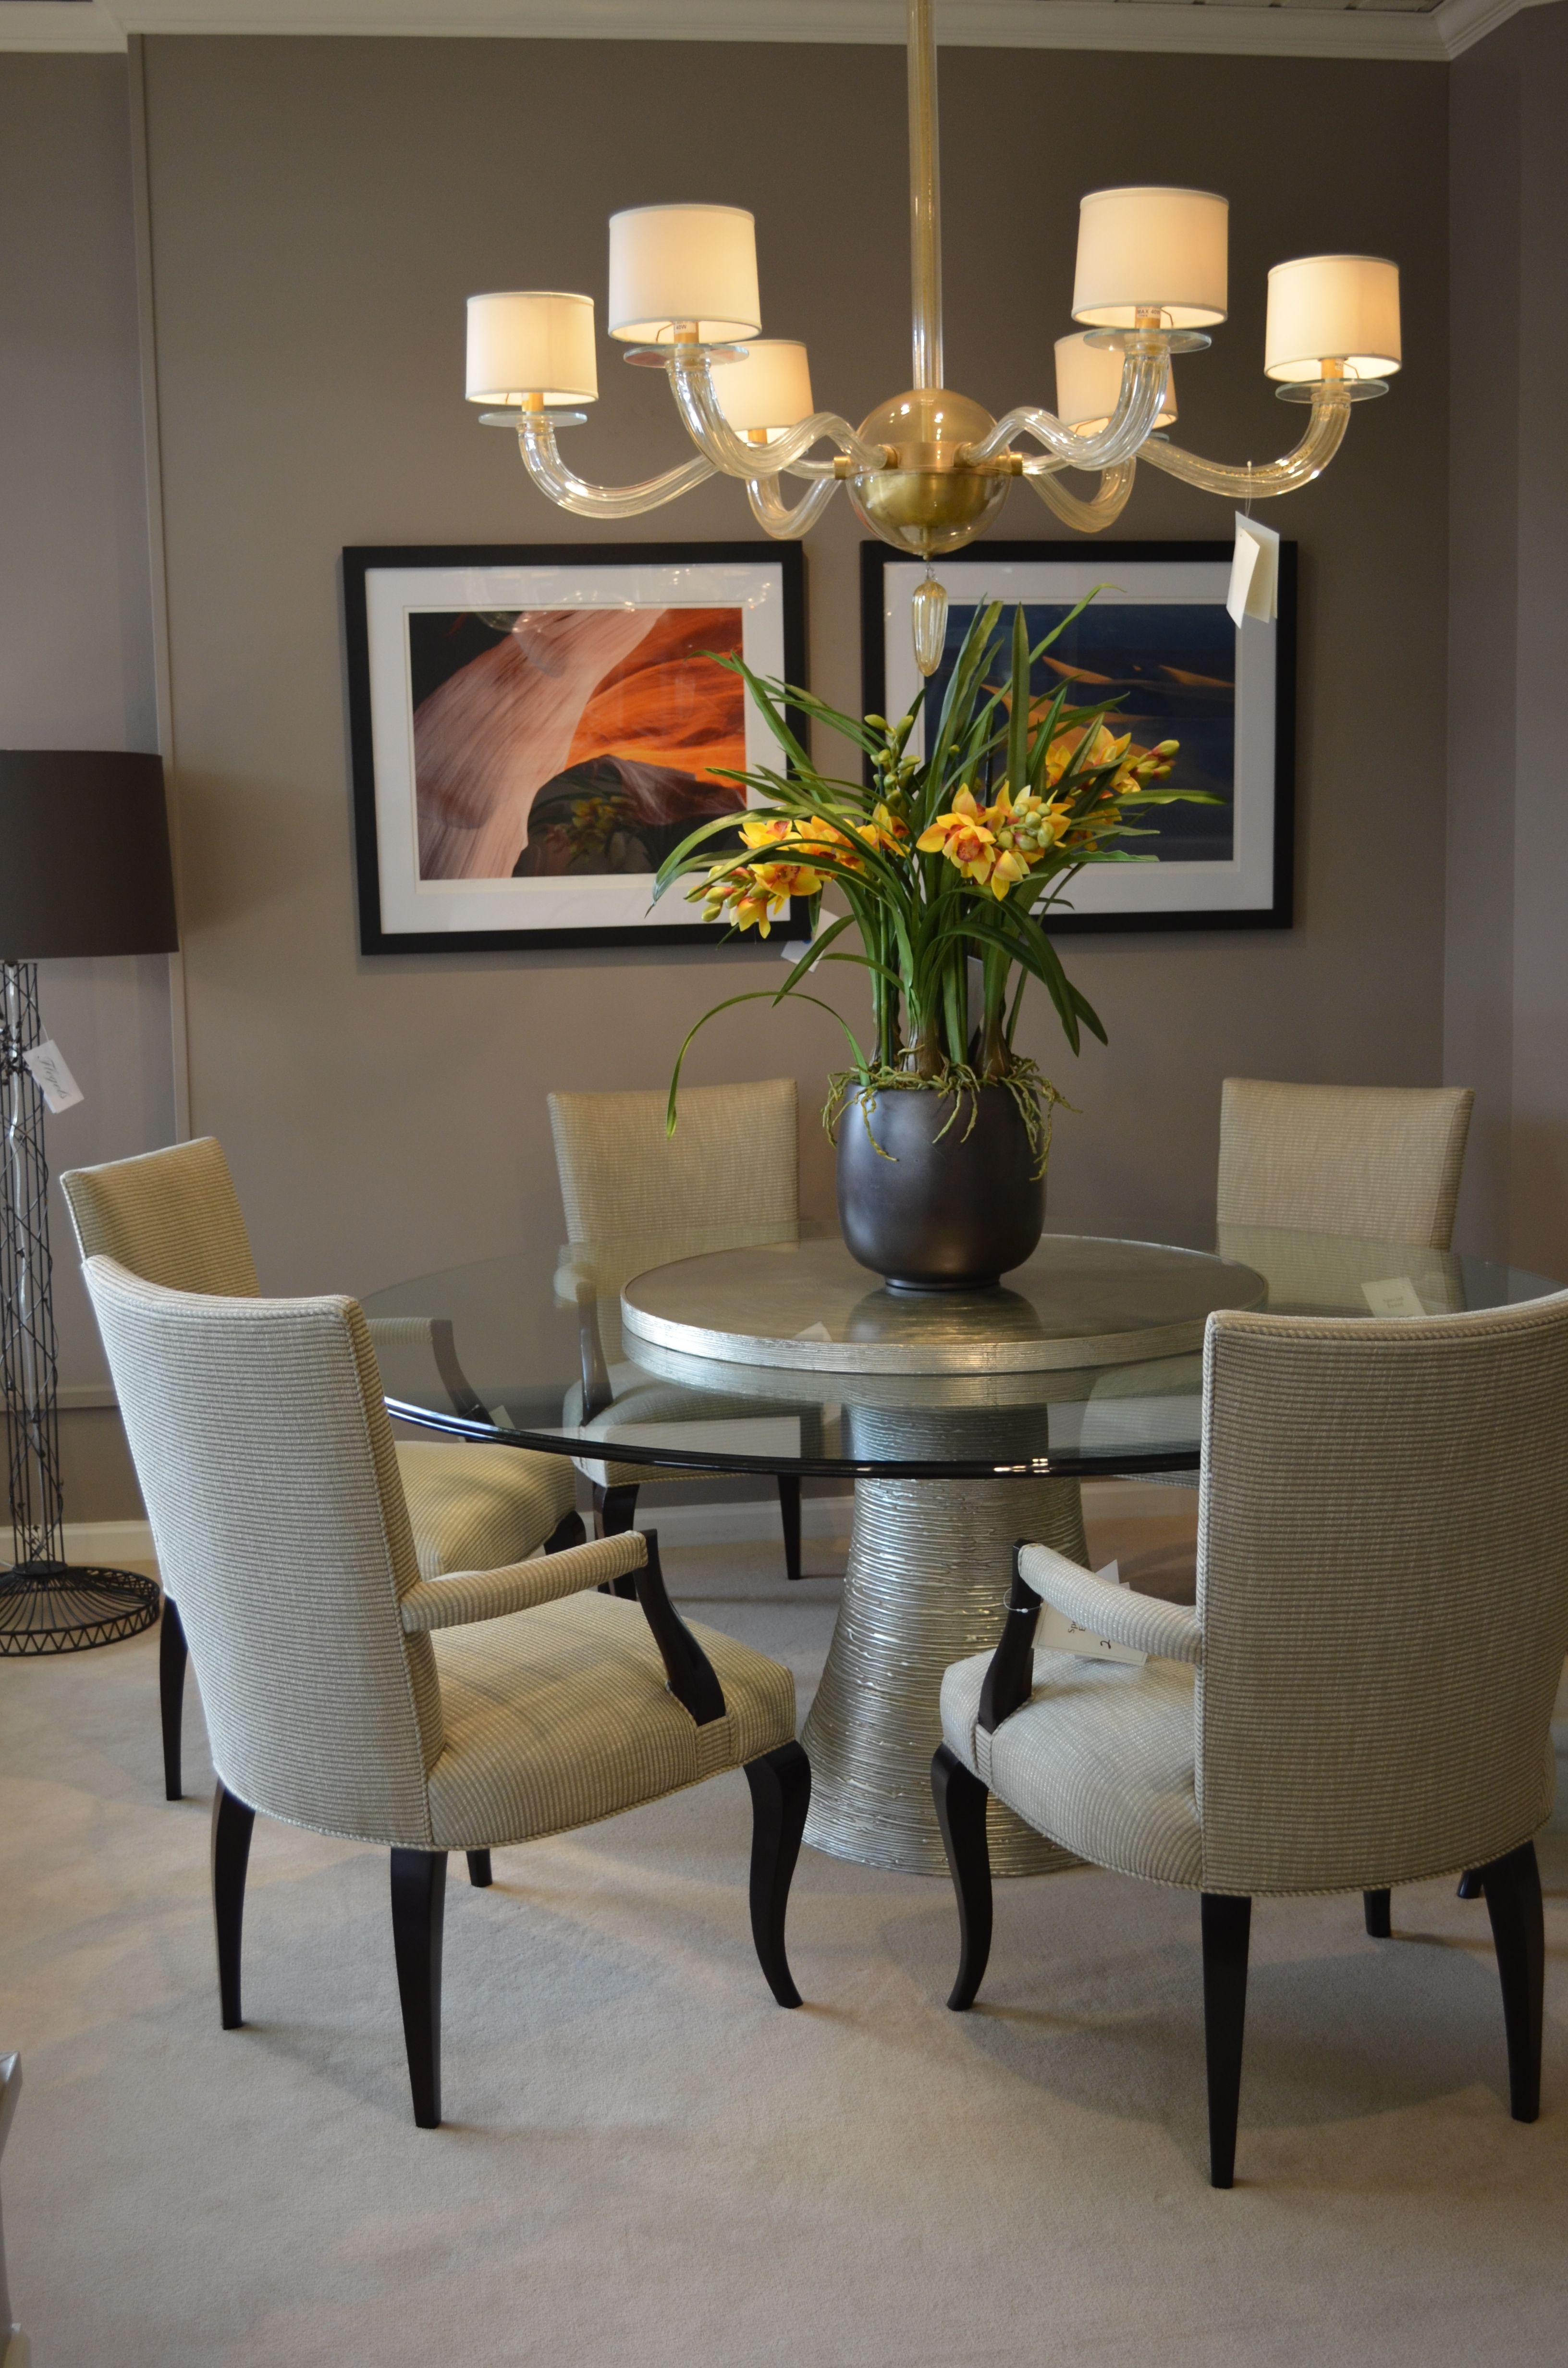 Dining In Style Flegels Home Furnishings In Menlo Park Showroom